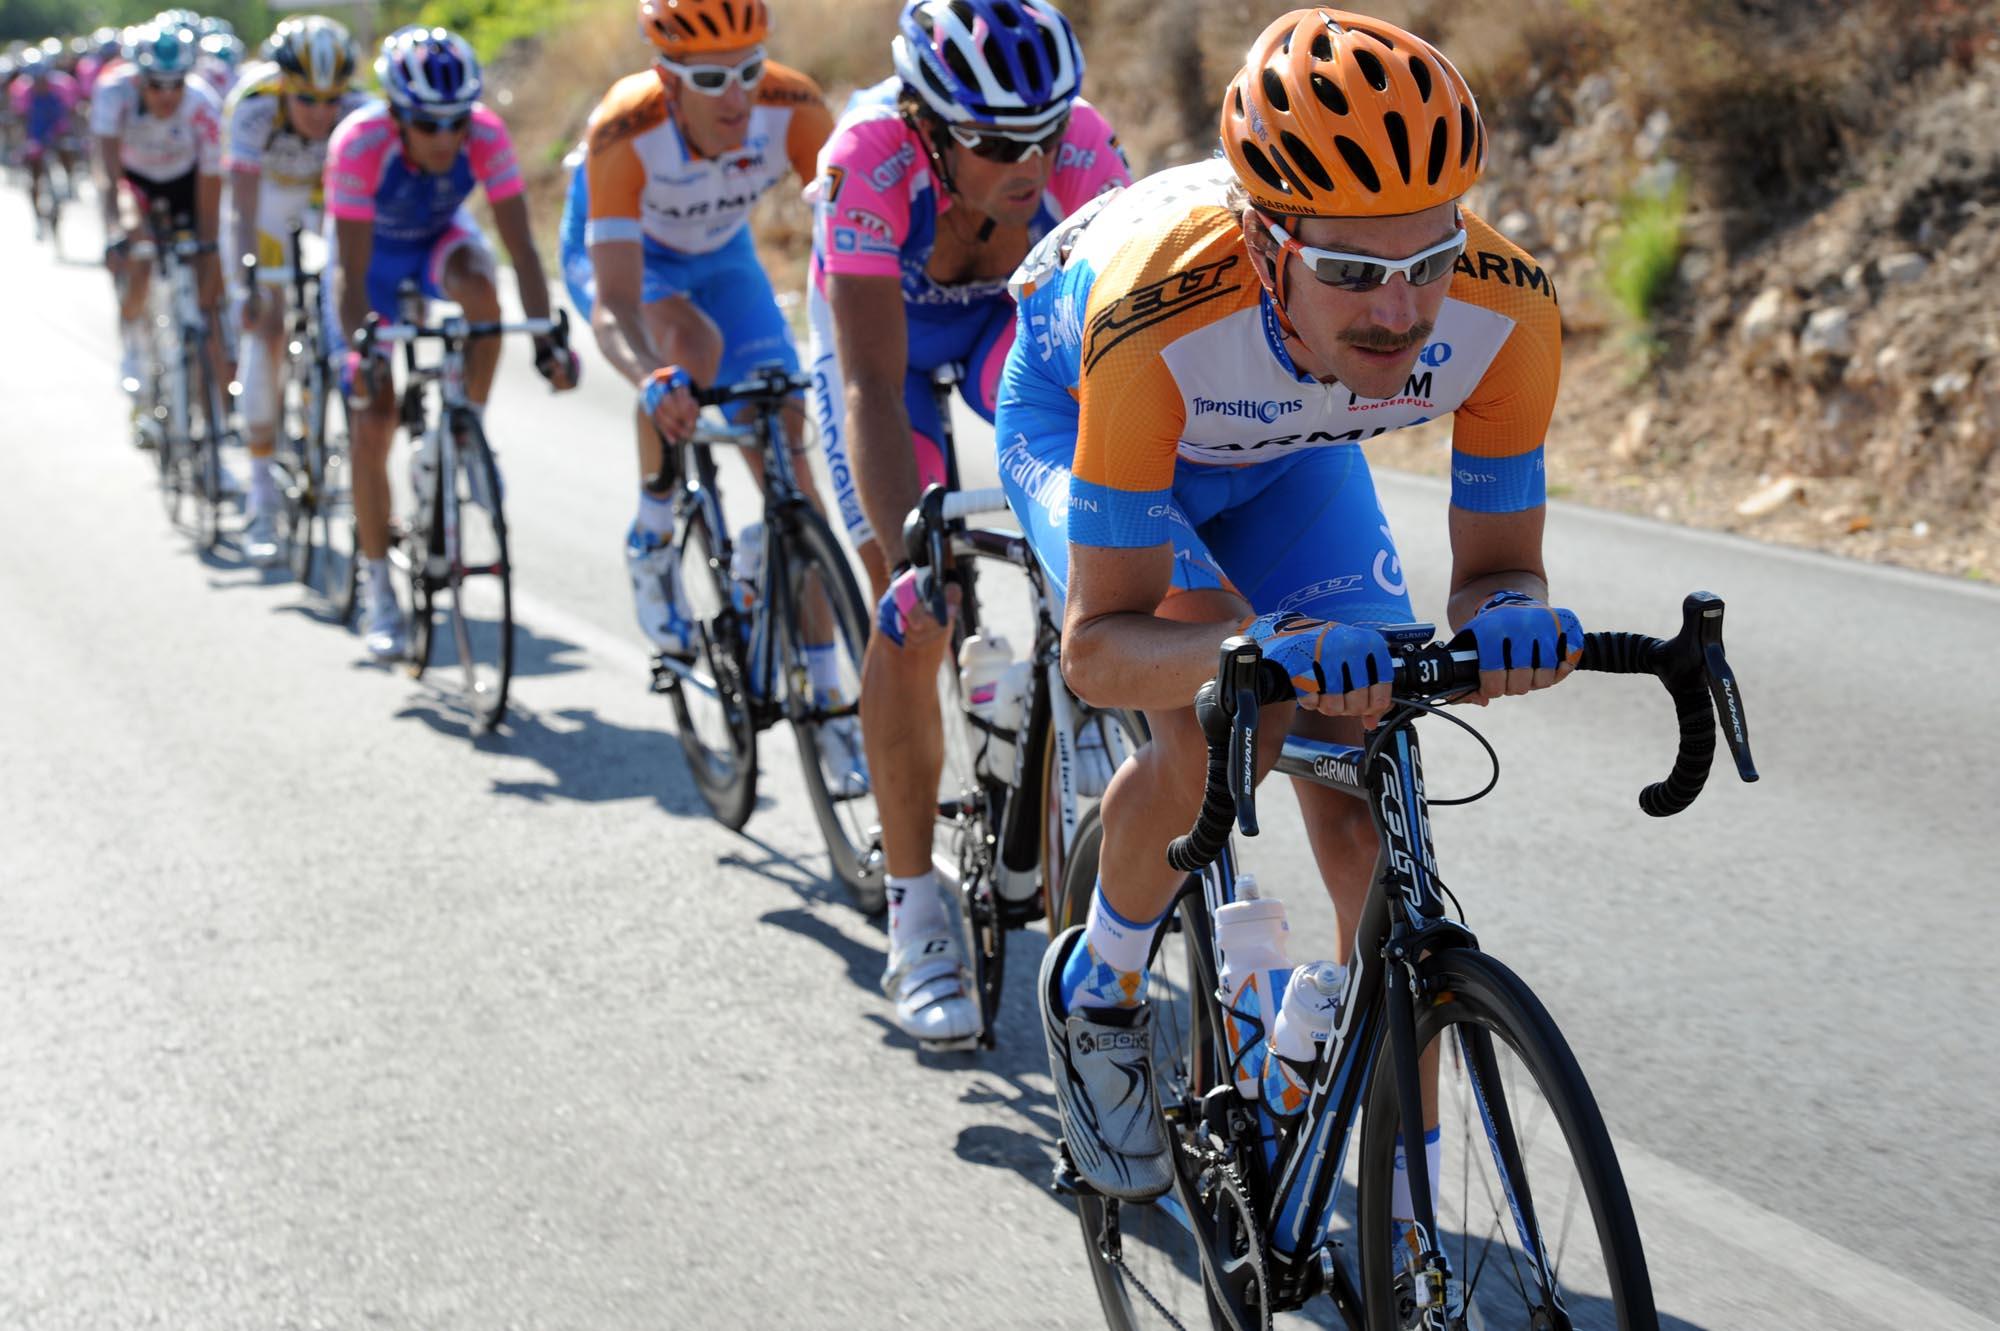 David Zabriskie leads chase, Vuelta a Espana